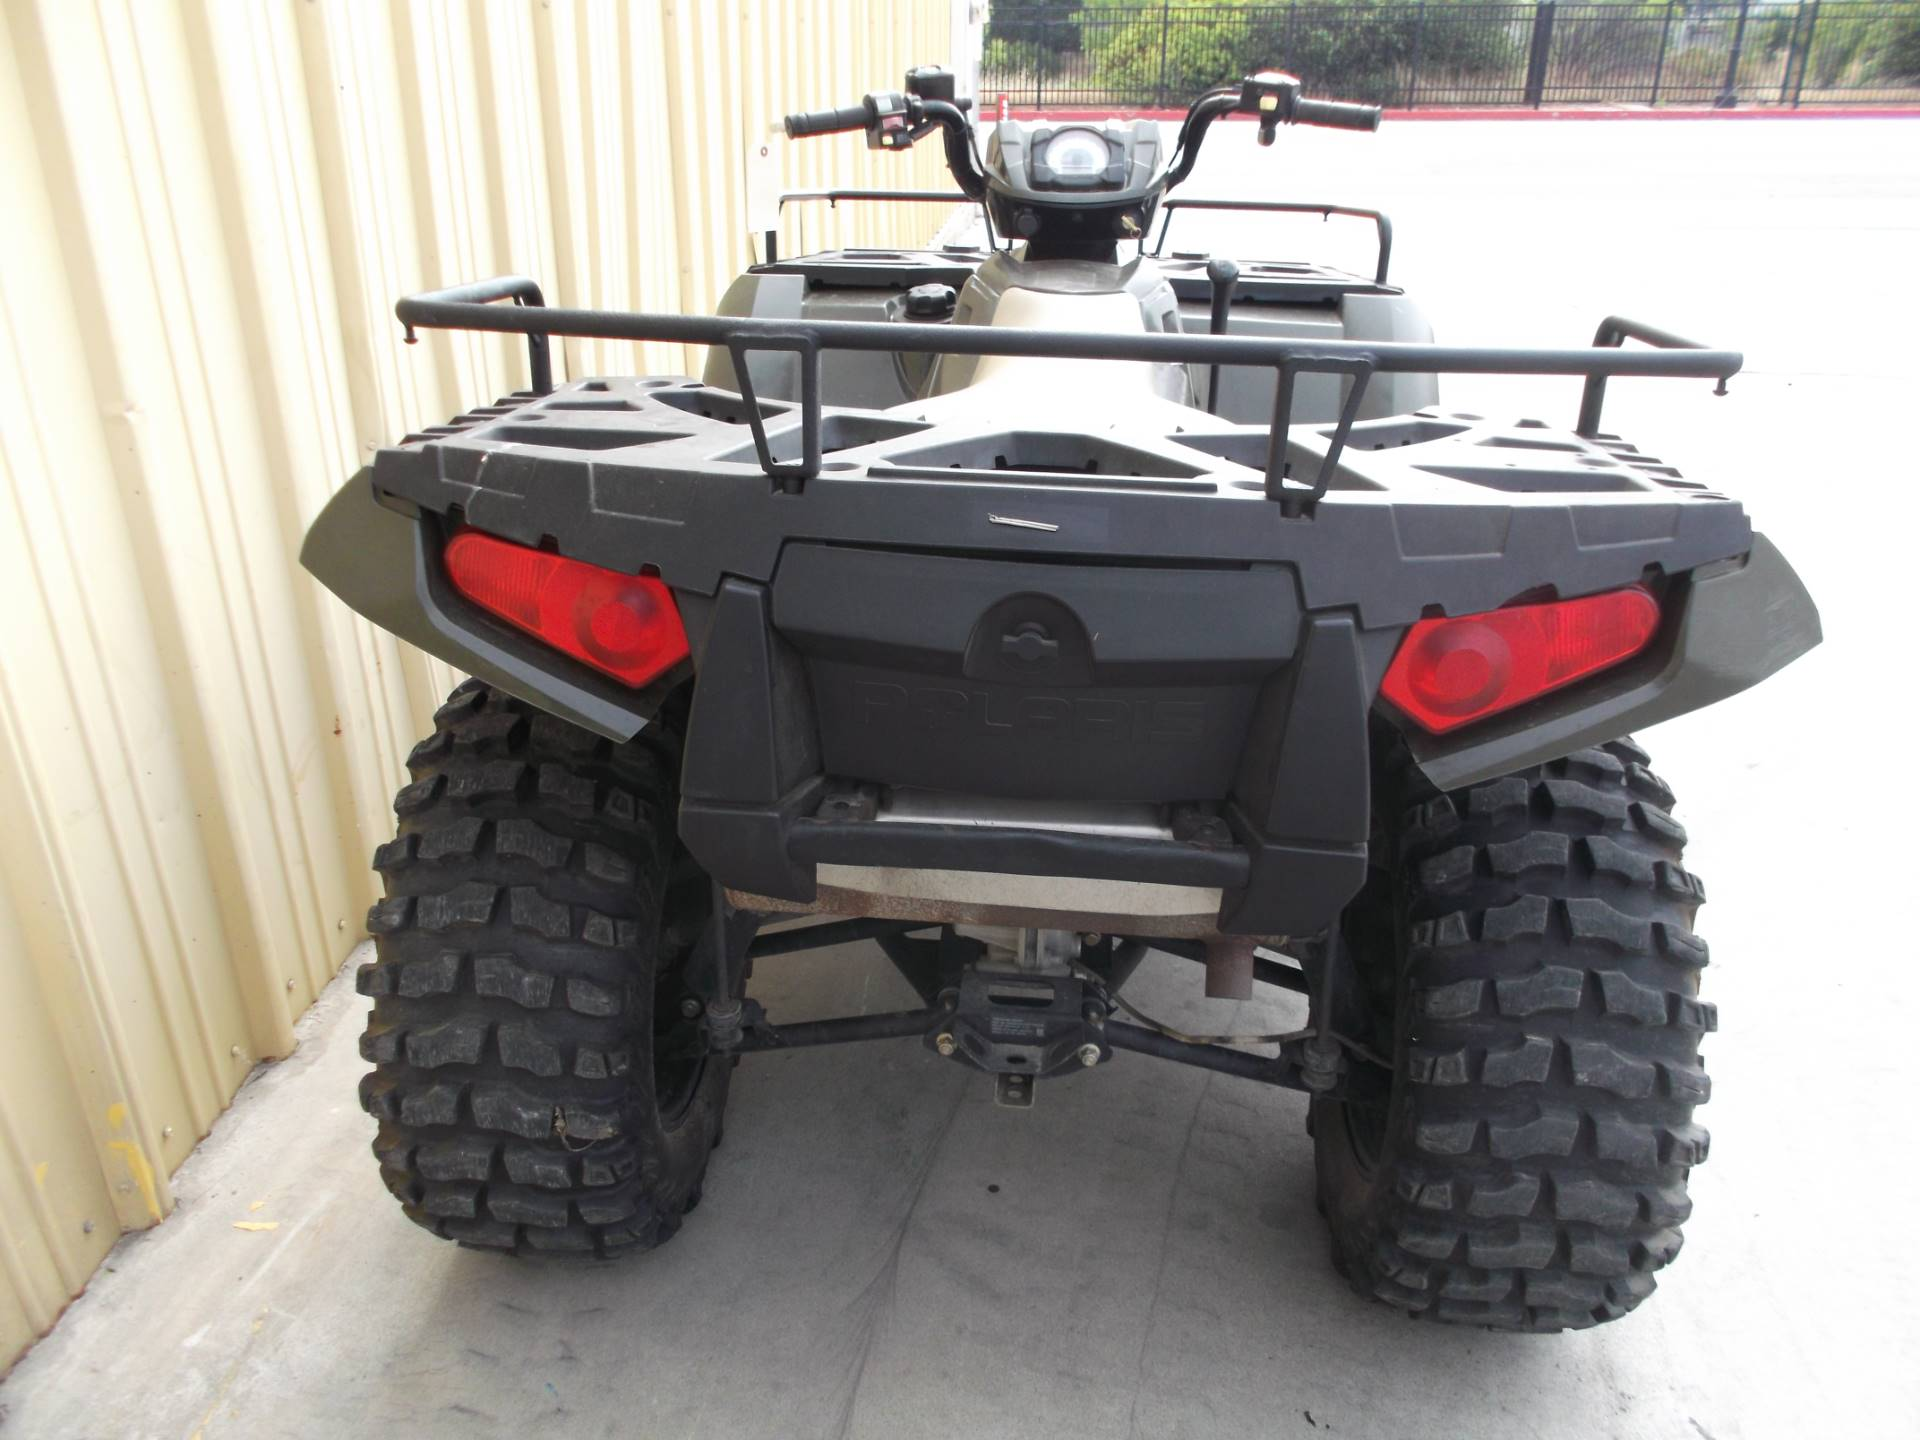 2012 Polaris Sportsman® 550 in Paso Robles, California